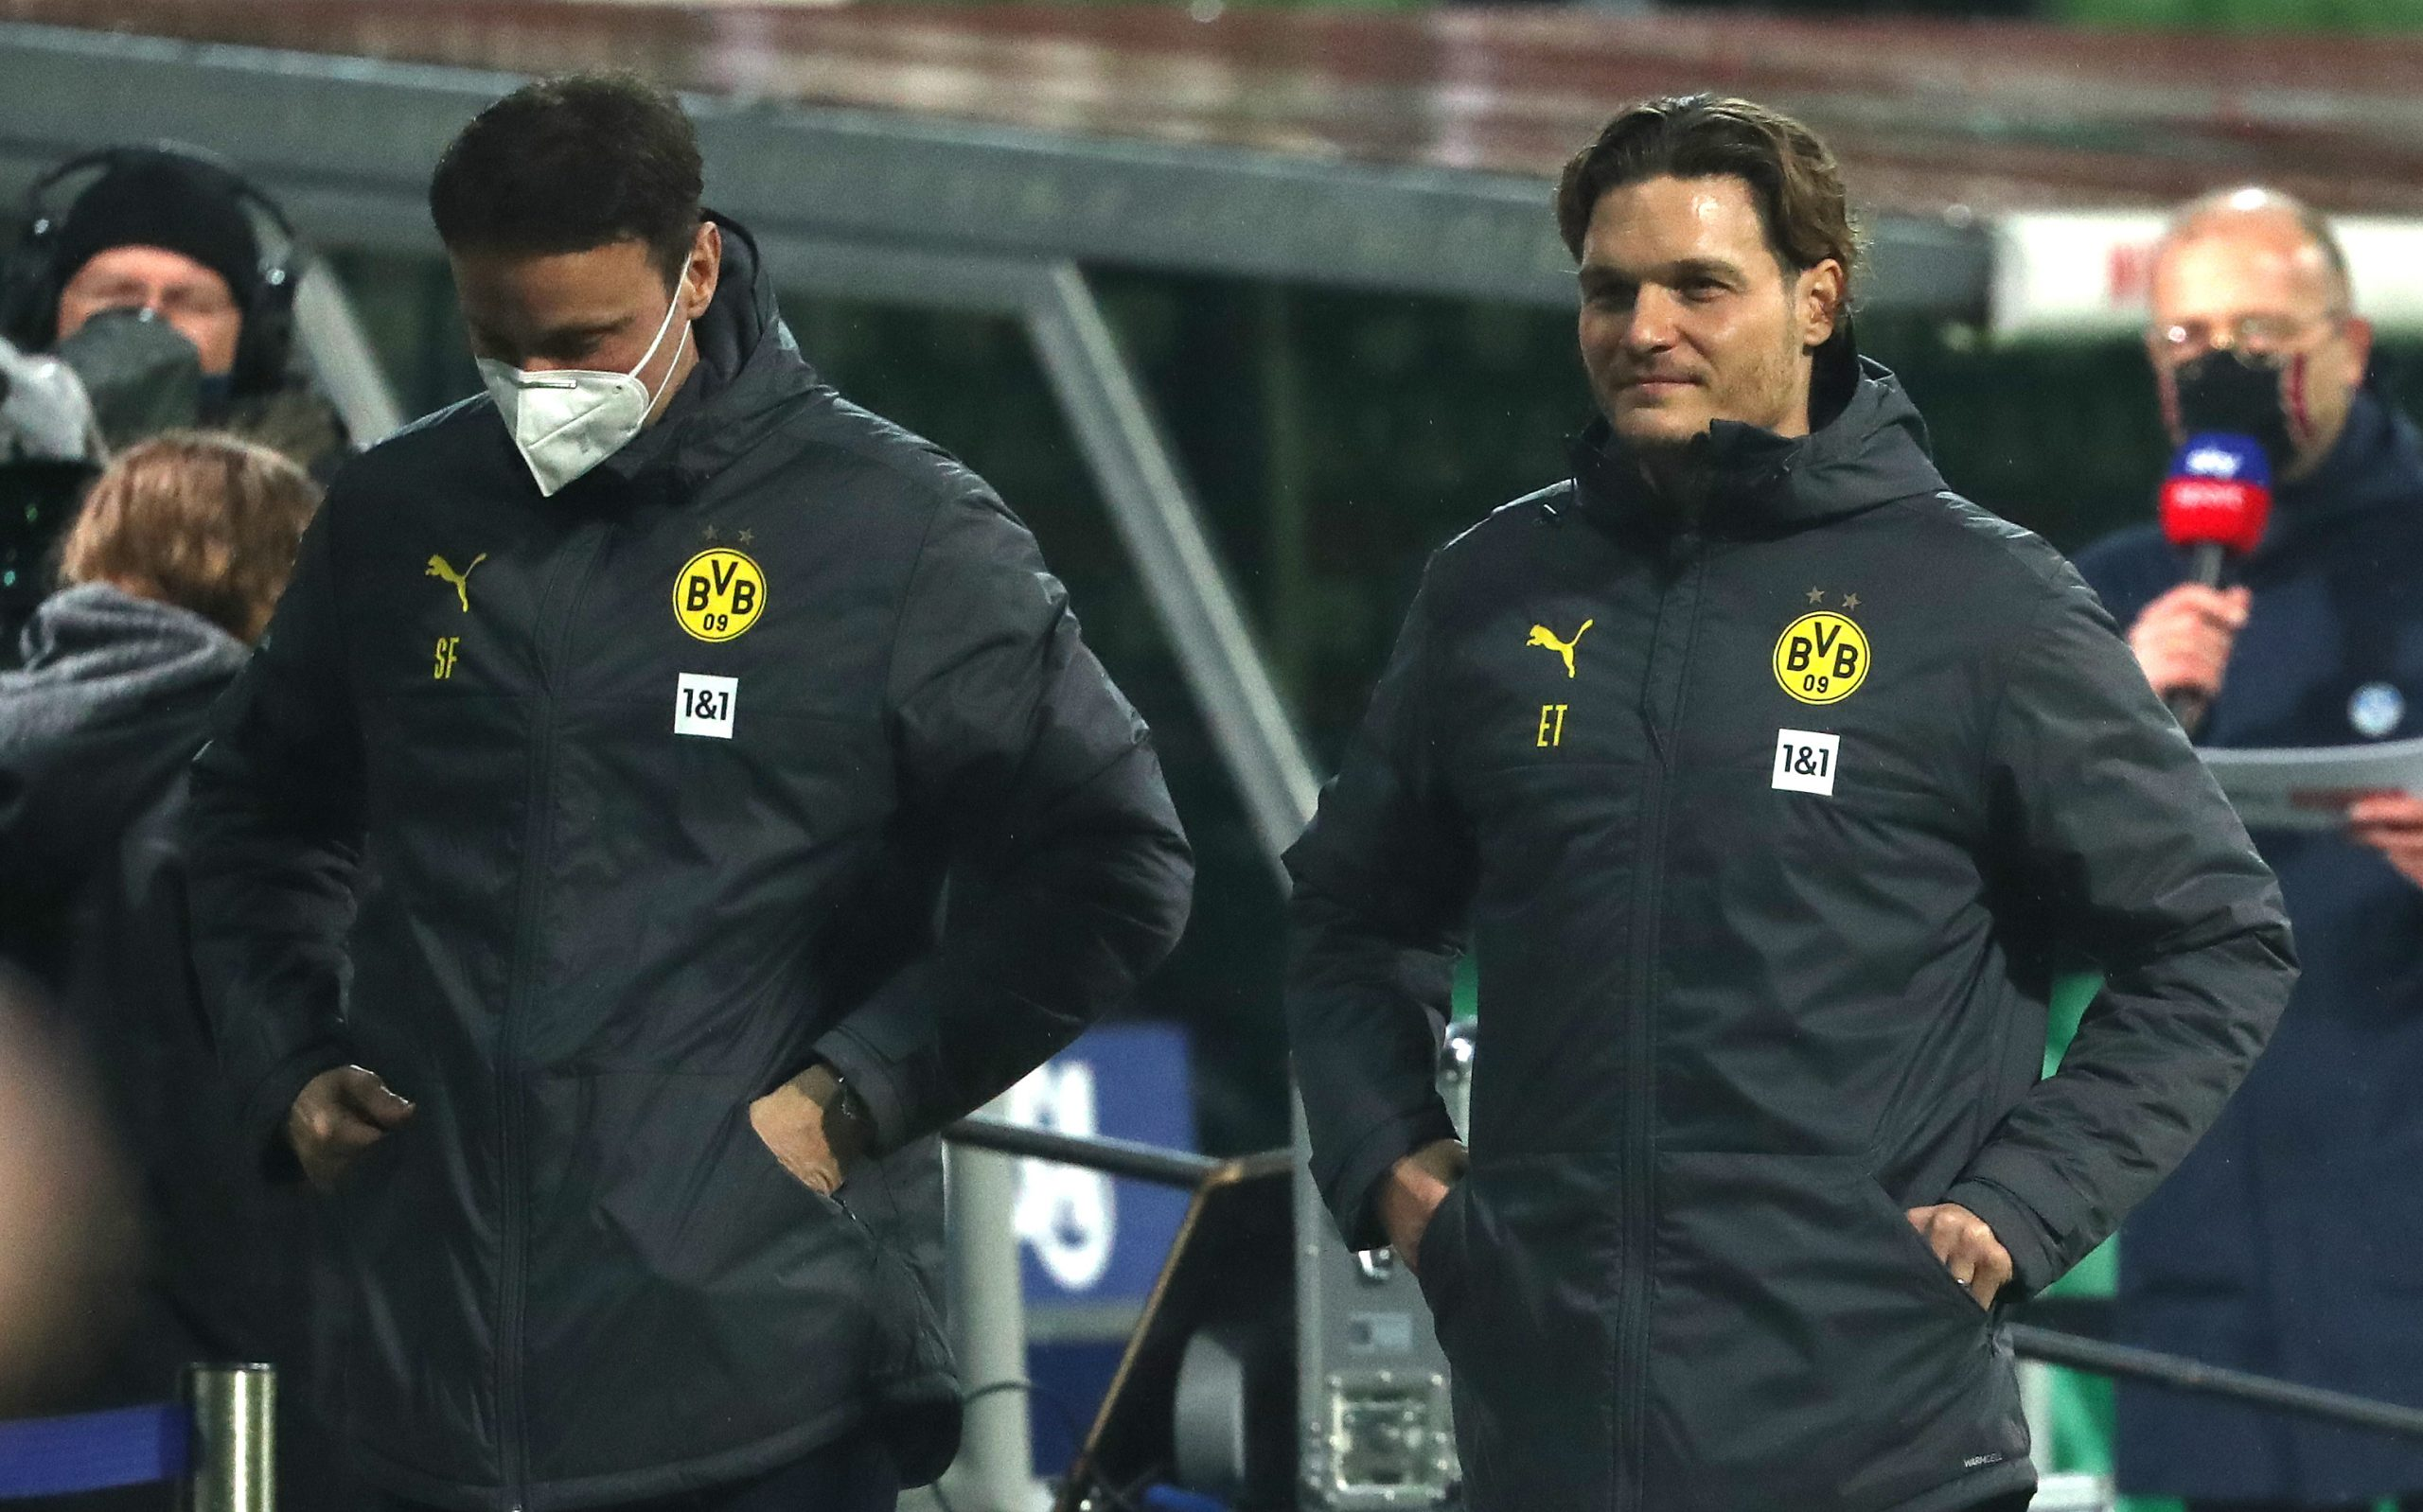 Werder Bremen vs Borussia Dortmund - Terzic smiles